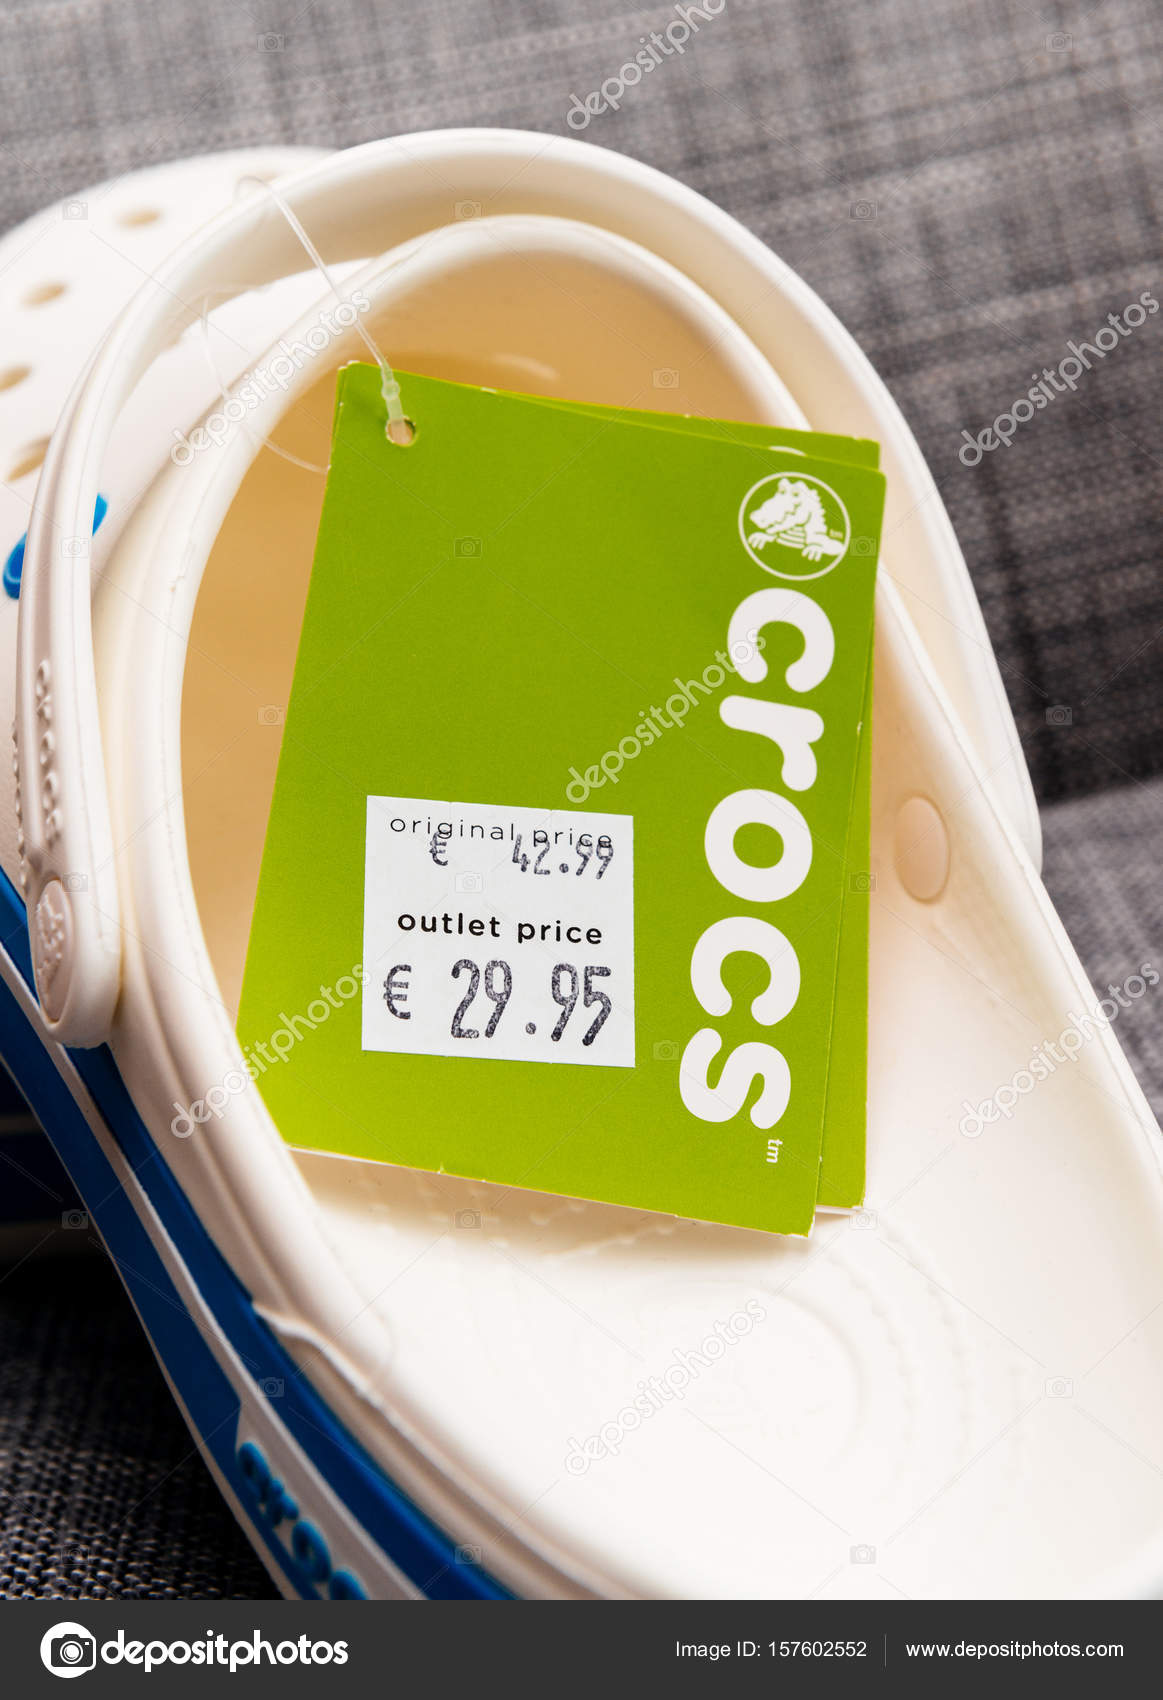 7b709b6c218 Crocs τσόκαρα παπούτσια ψώνια τσάντα σε γκρίζο φόντο– Εκδοτικές Φωτογραφίες  Αρχείου